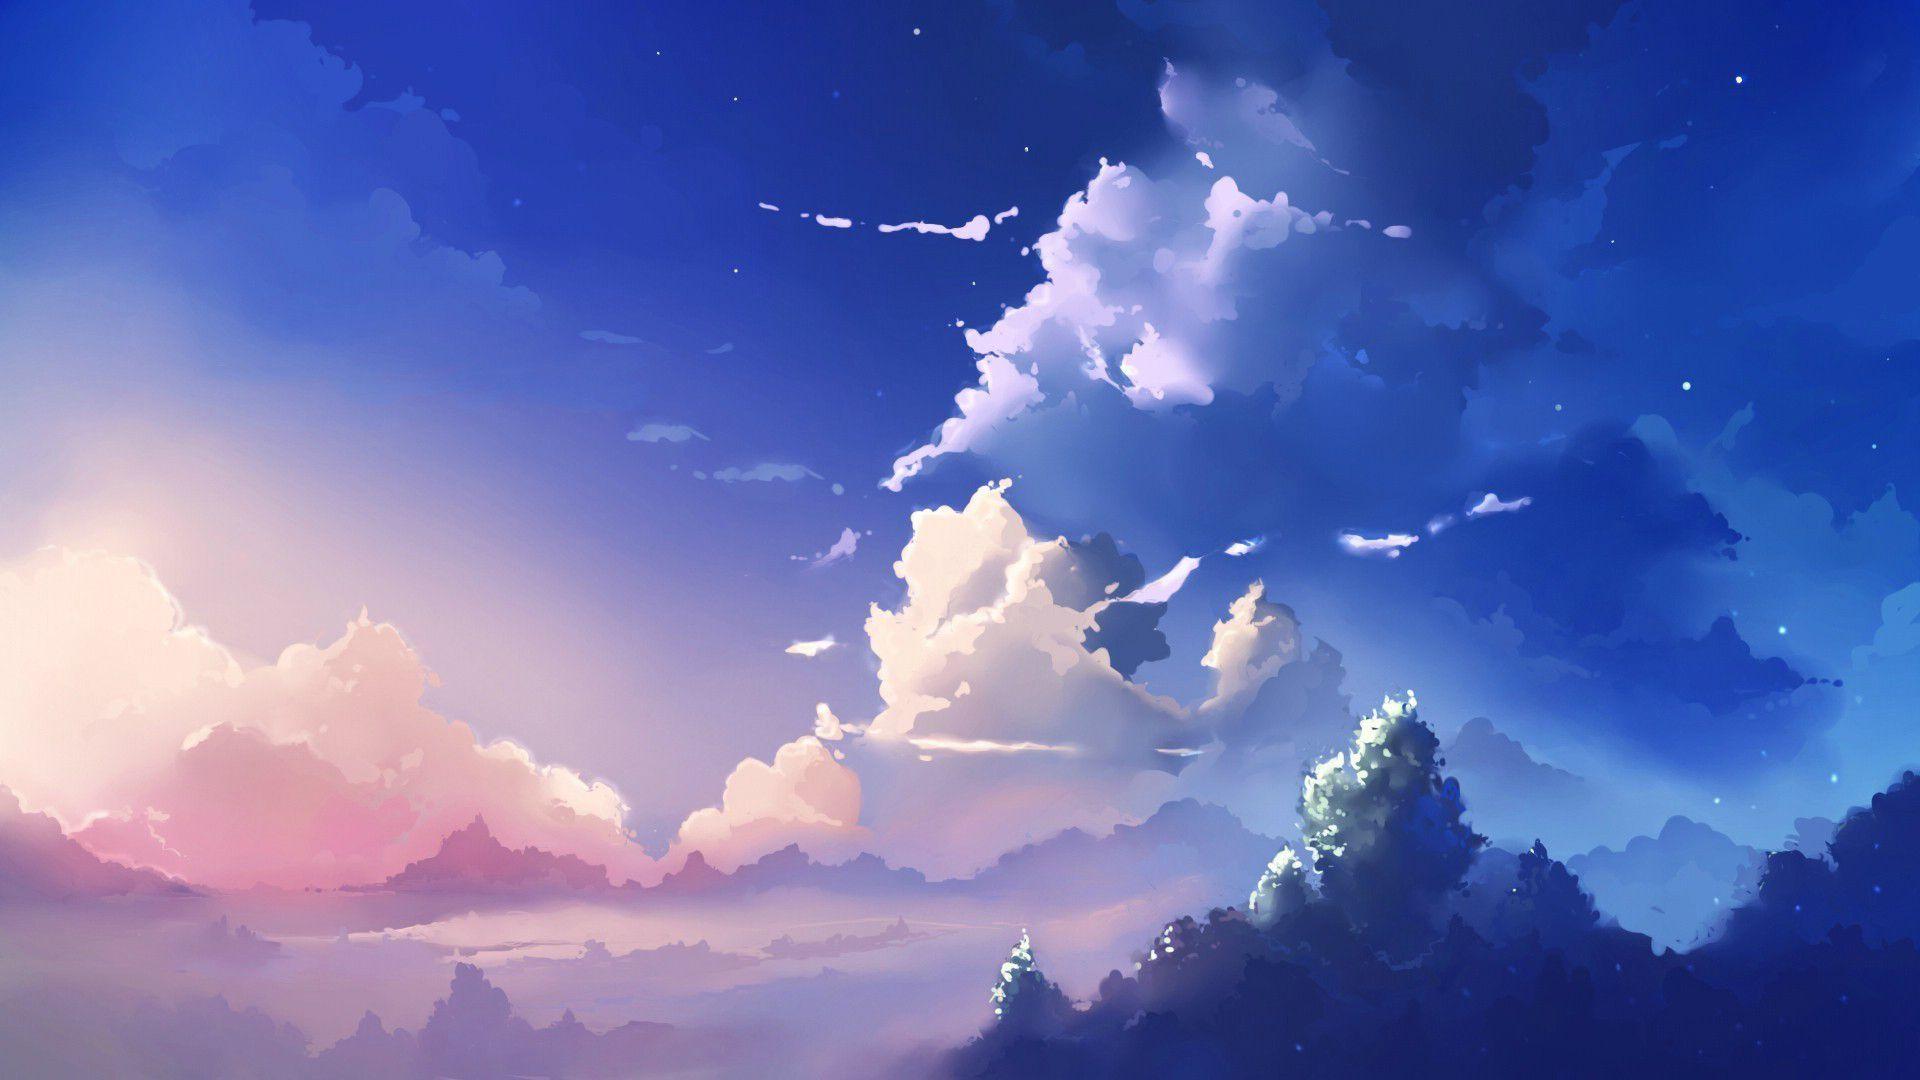 The Creator Writings To Move Mountains Anime scenery